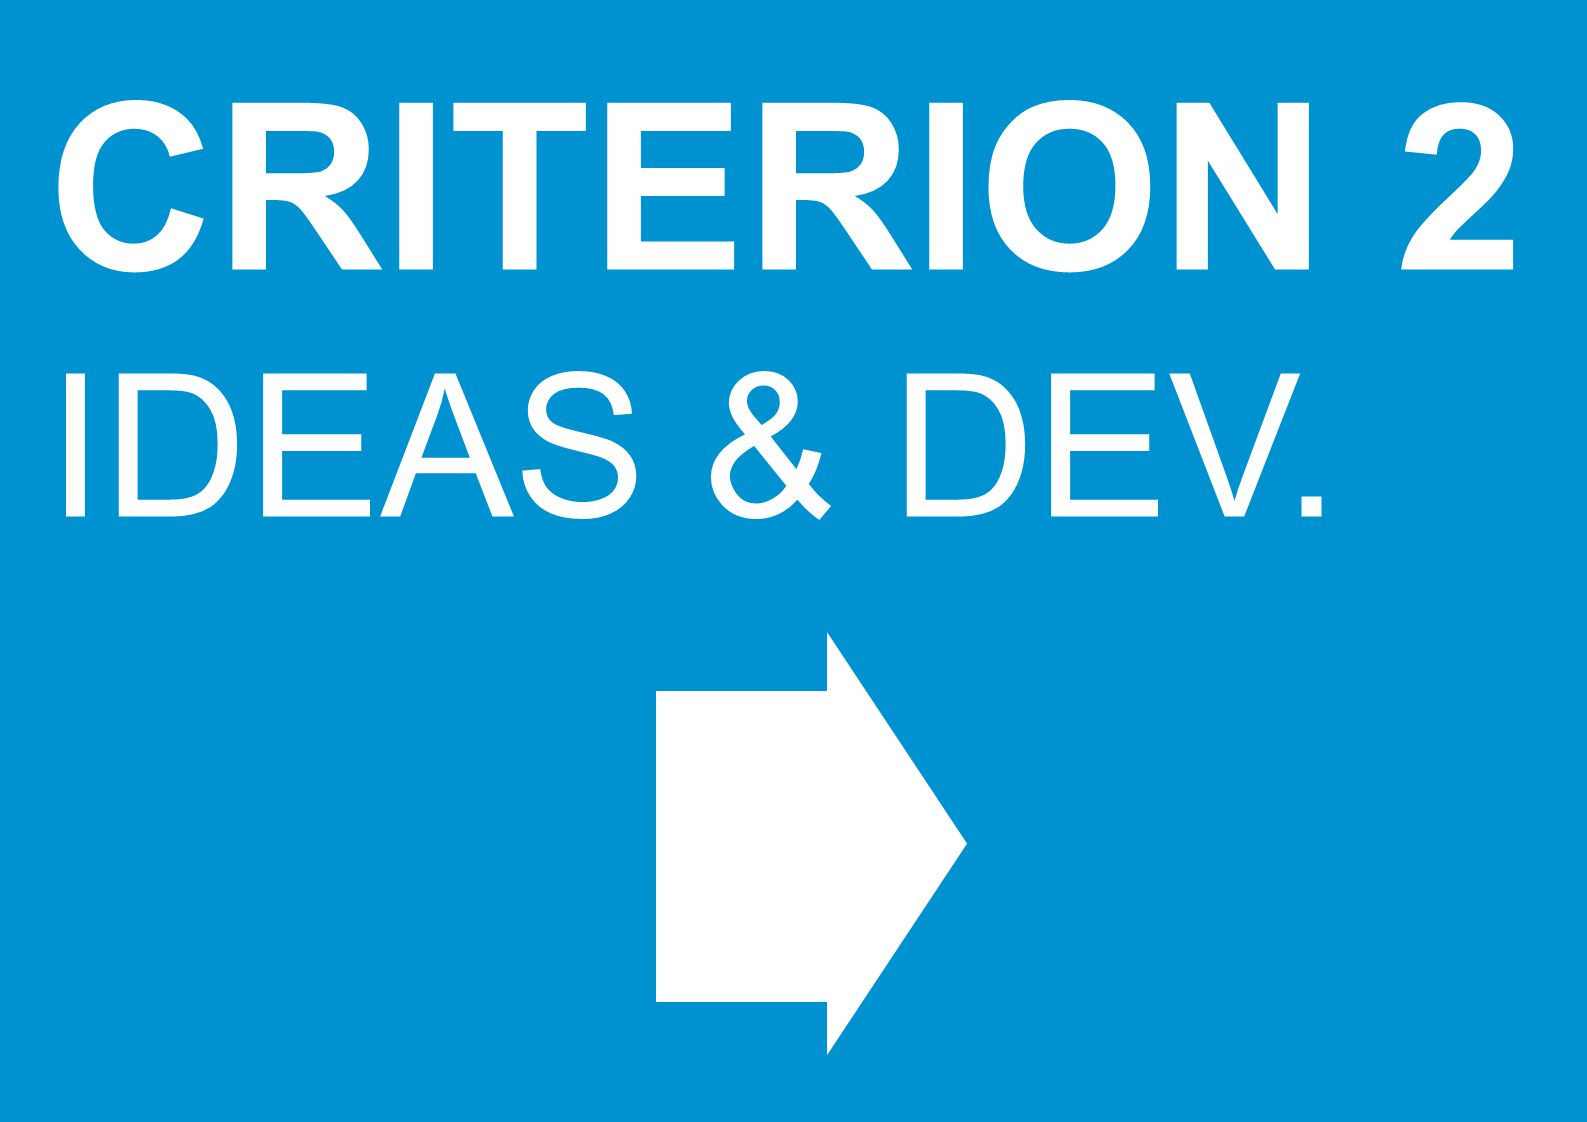 CRITERION 2 IDEAS & DEV.